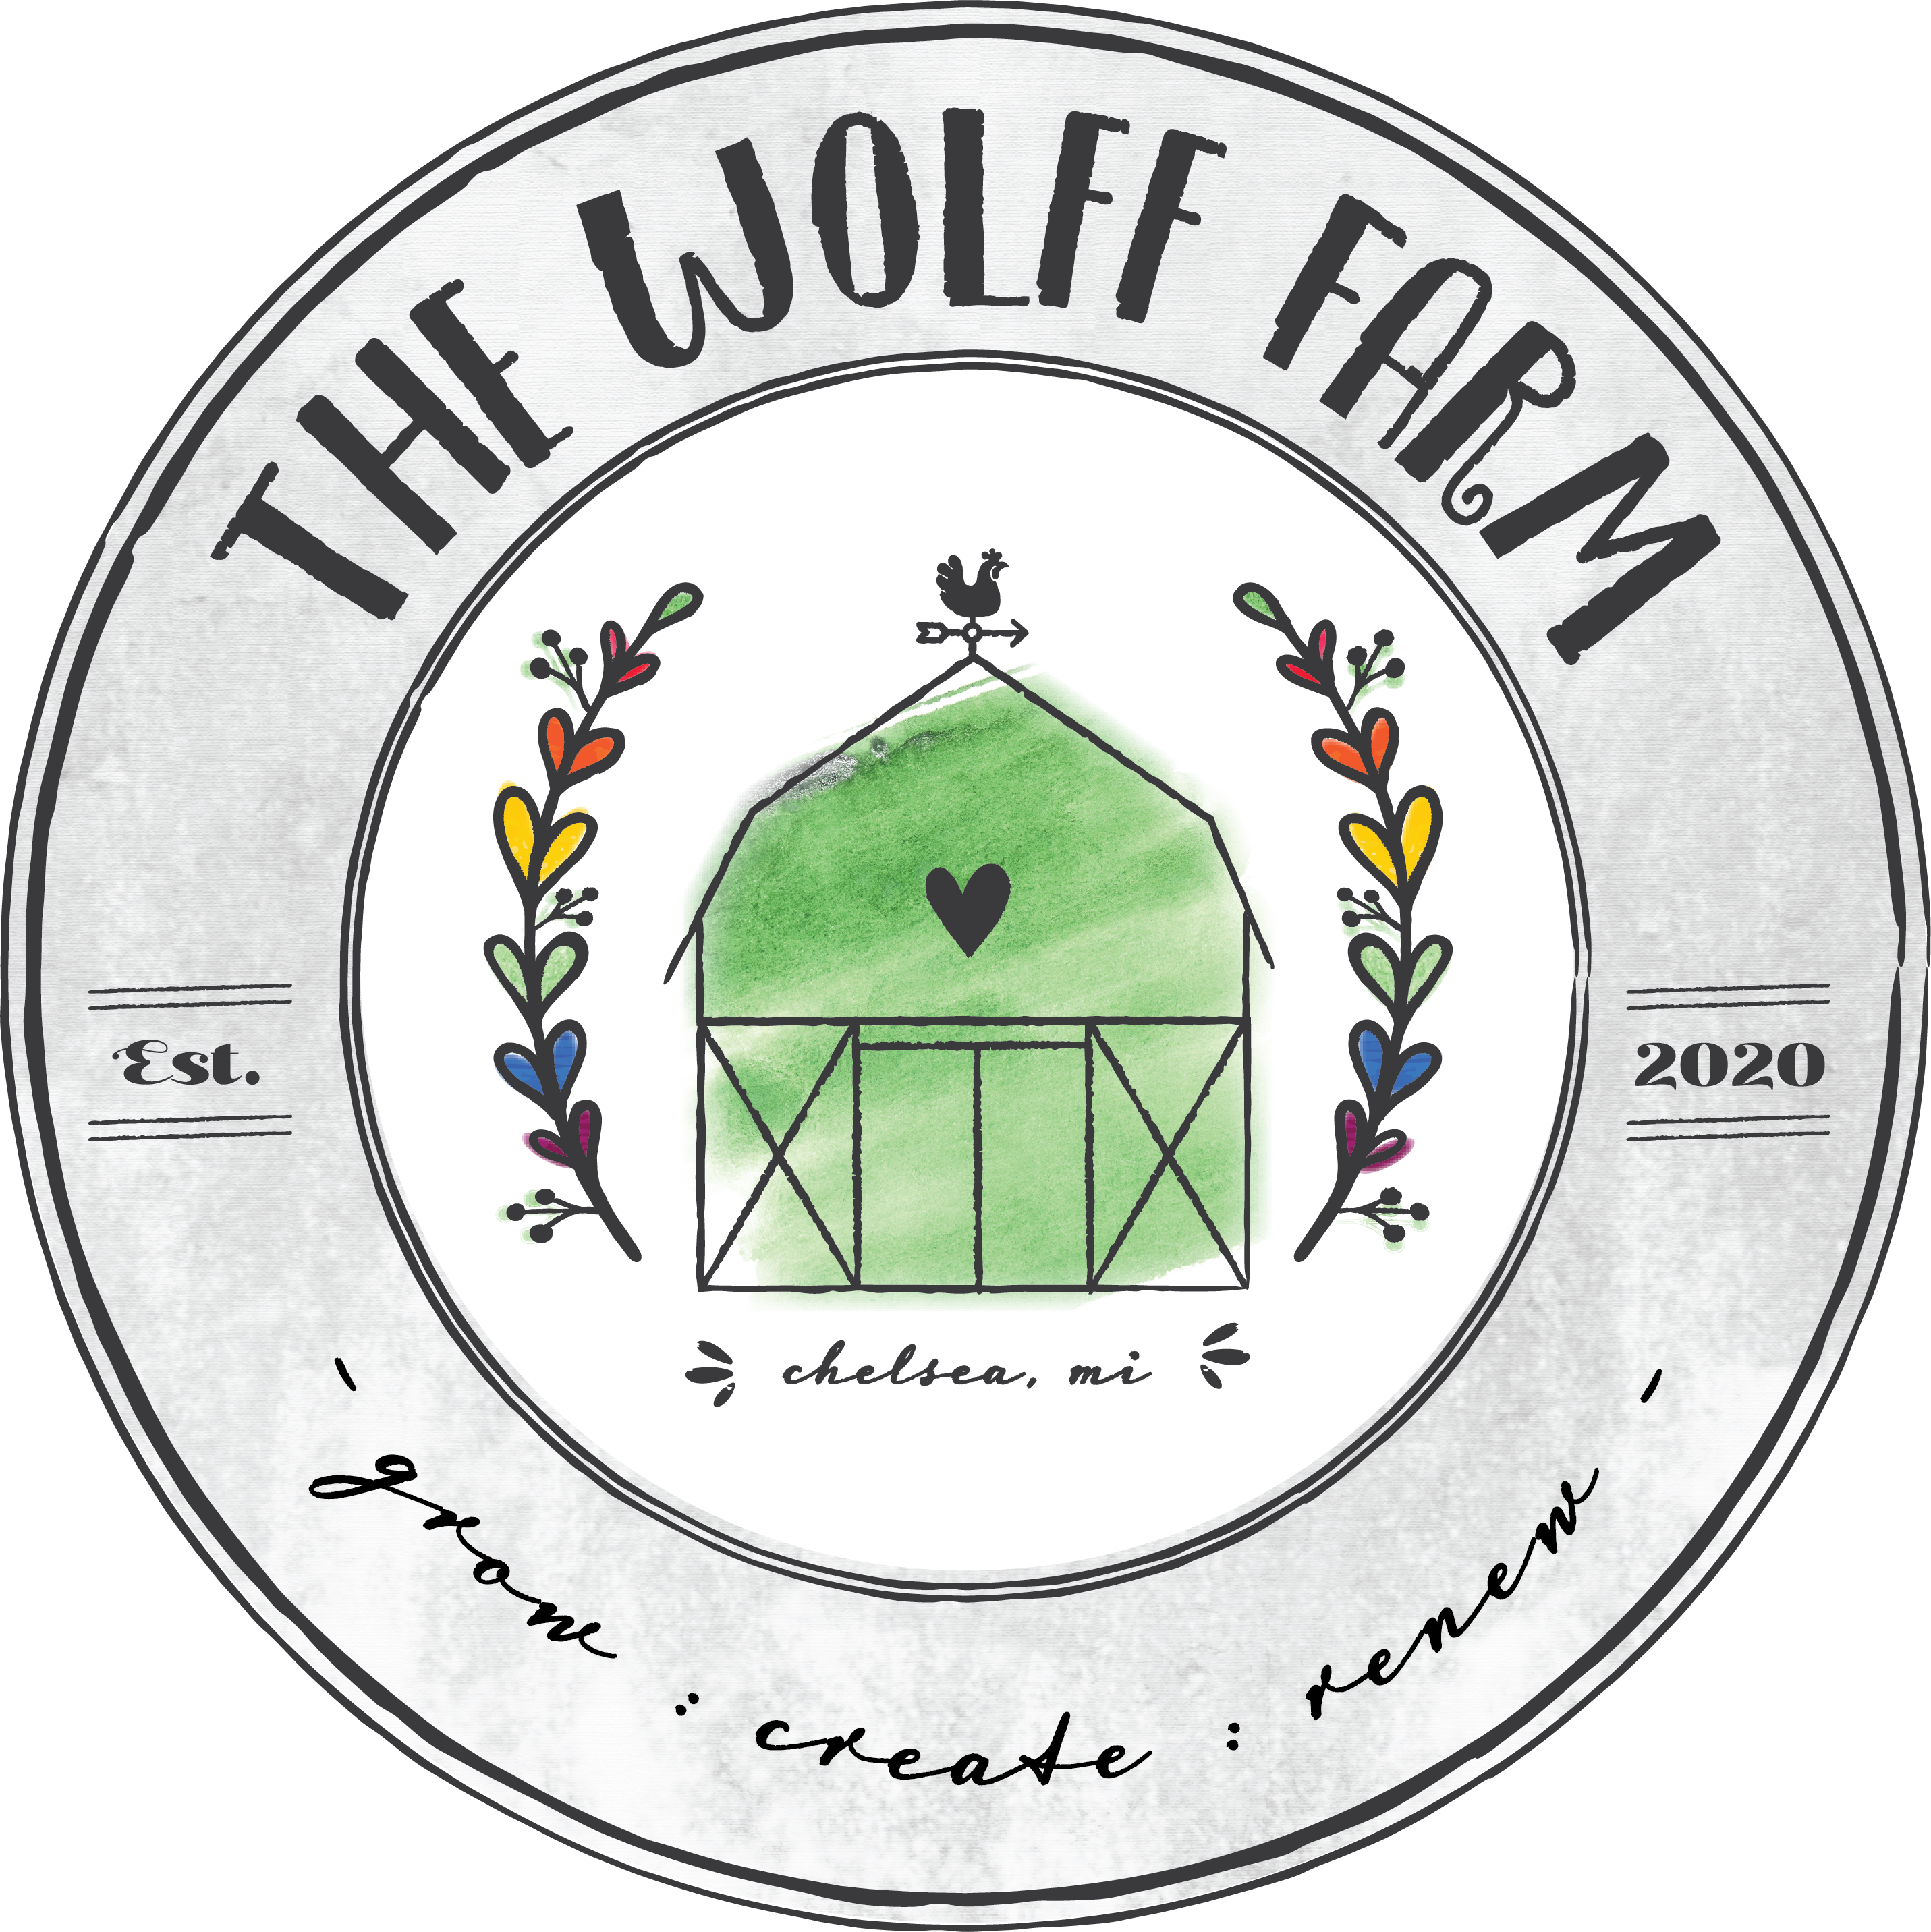 The Wolff Farm